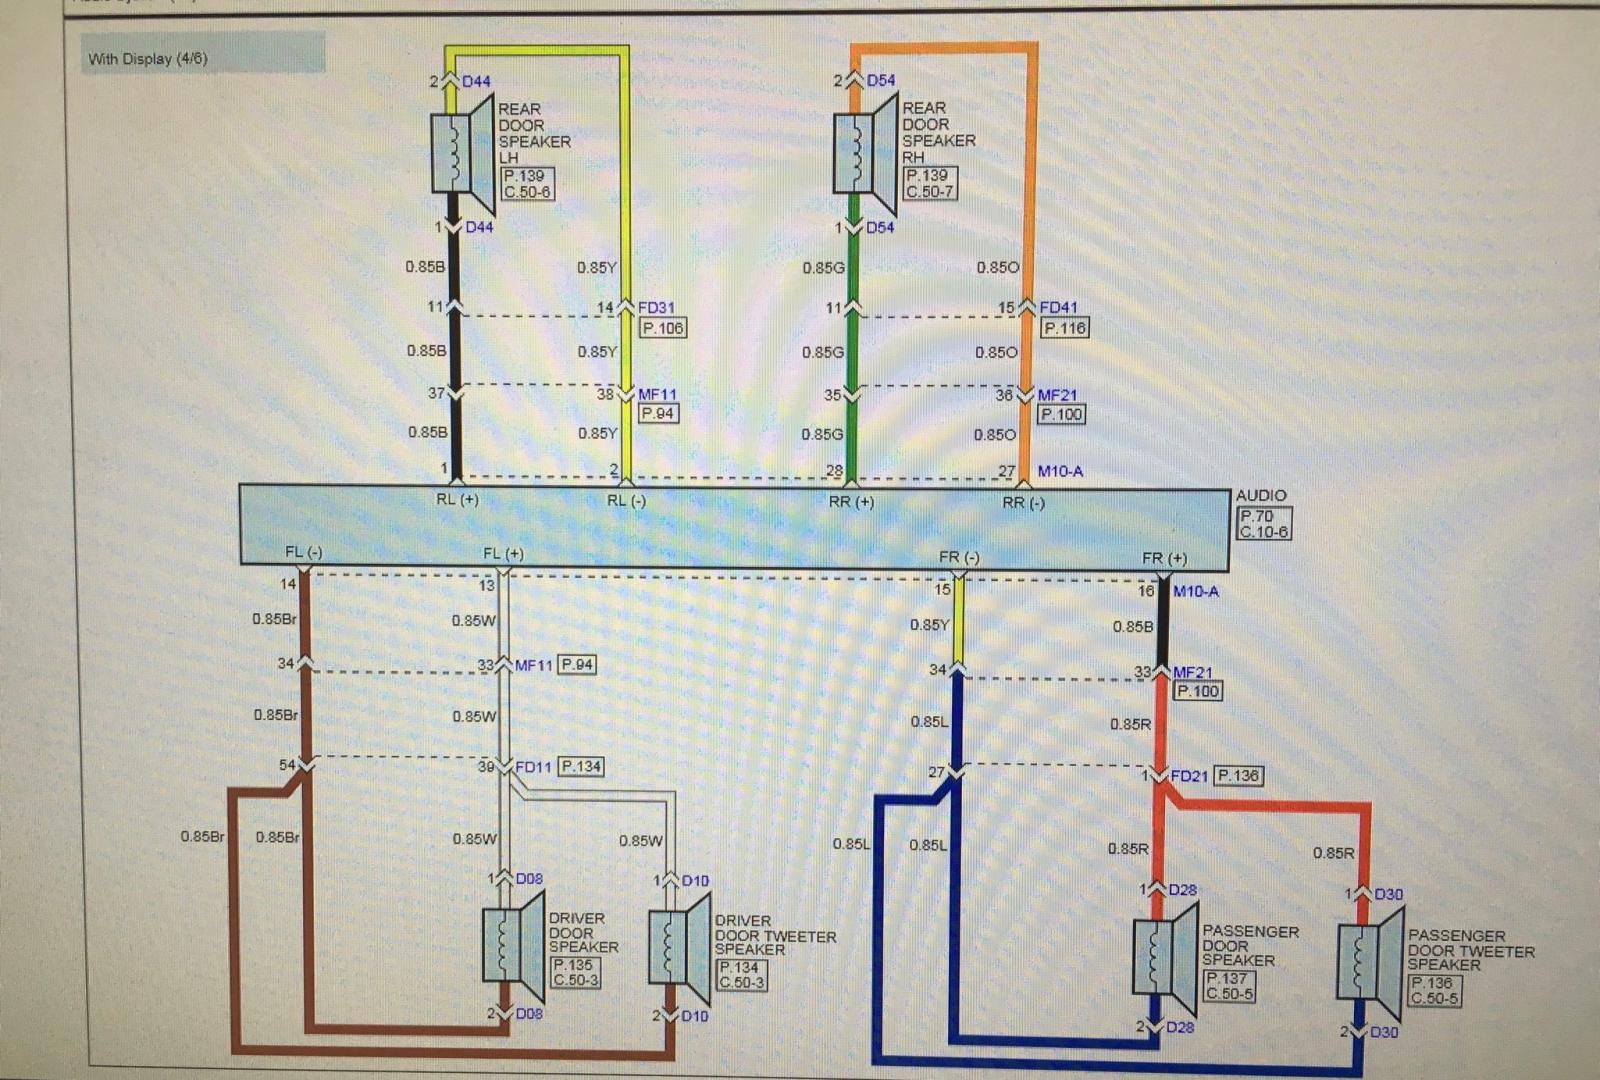 hight resolution of 2011 kia soul wiring diagram simple wiring diagram rh 12 1 1 mara cujas de 2007 mercury mariner parts list 50 horsepower mercury outboard diagram